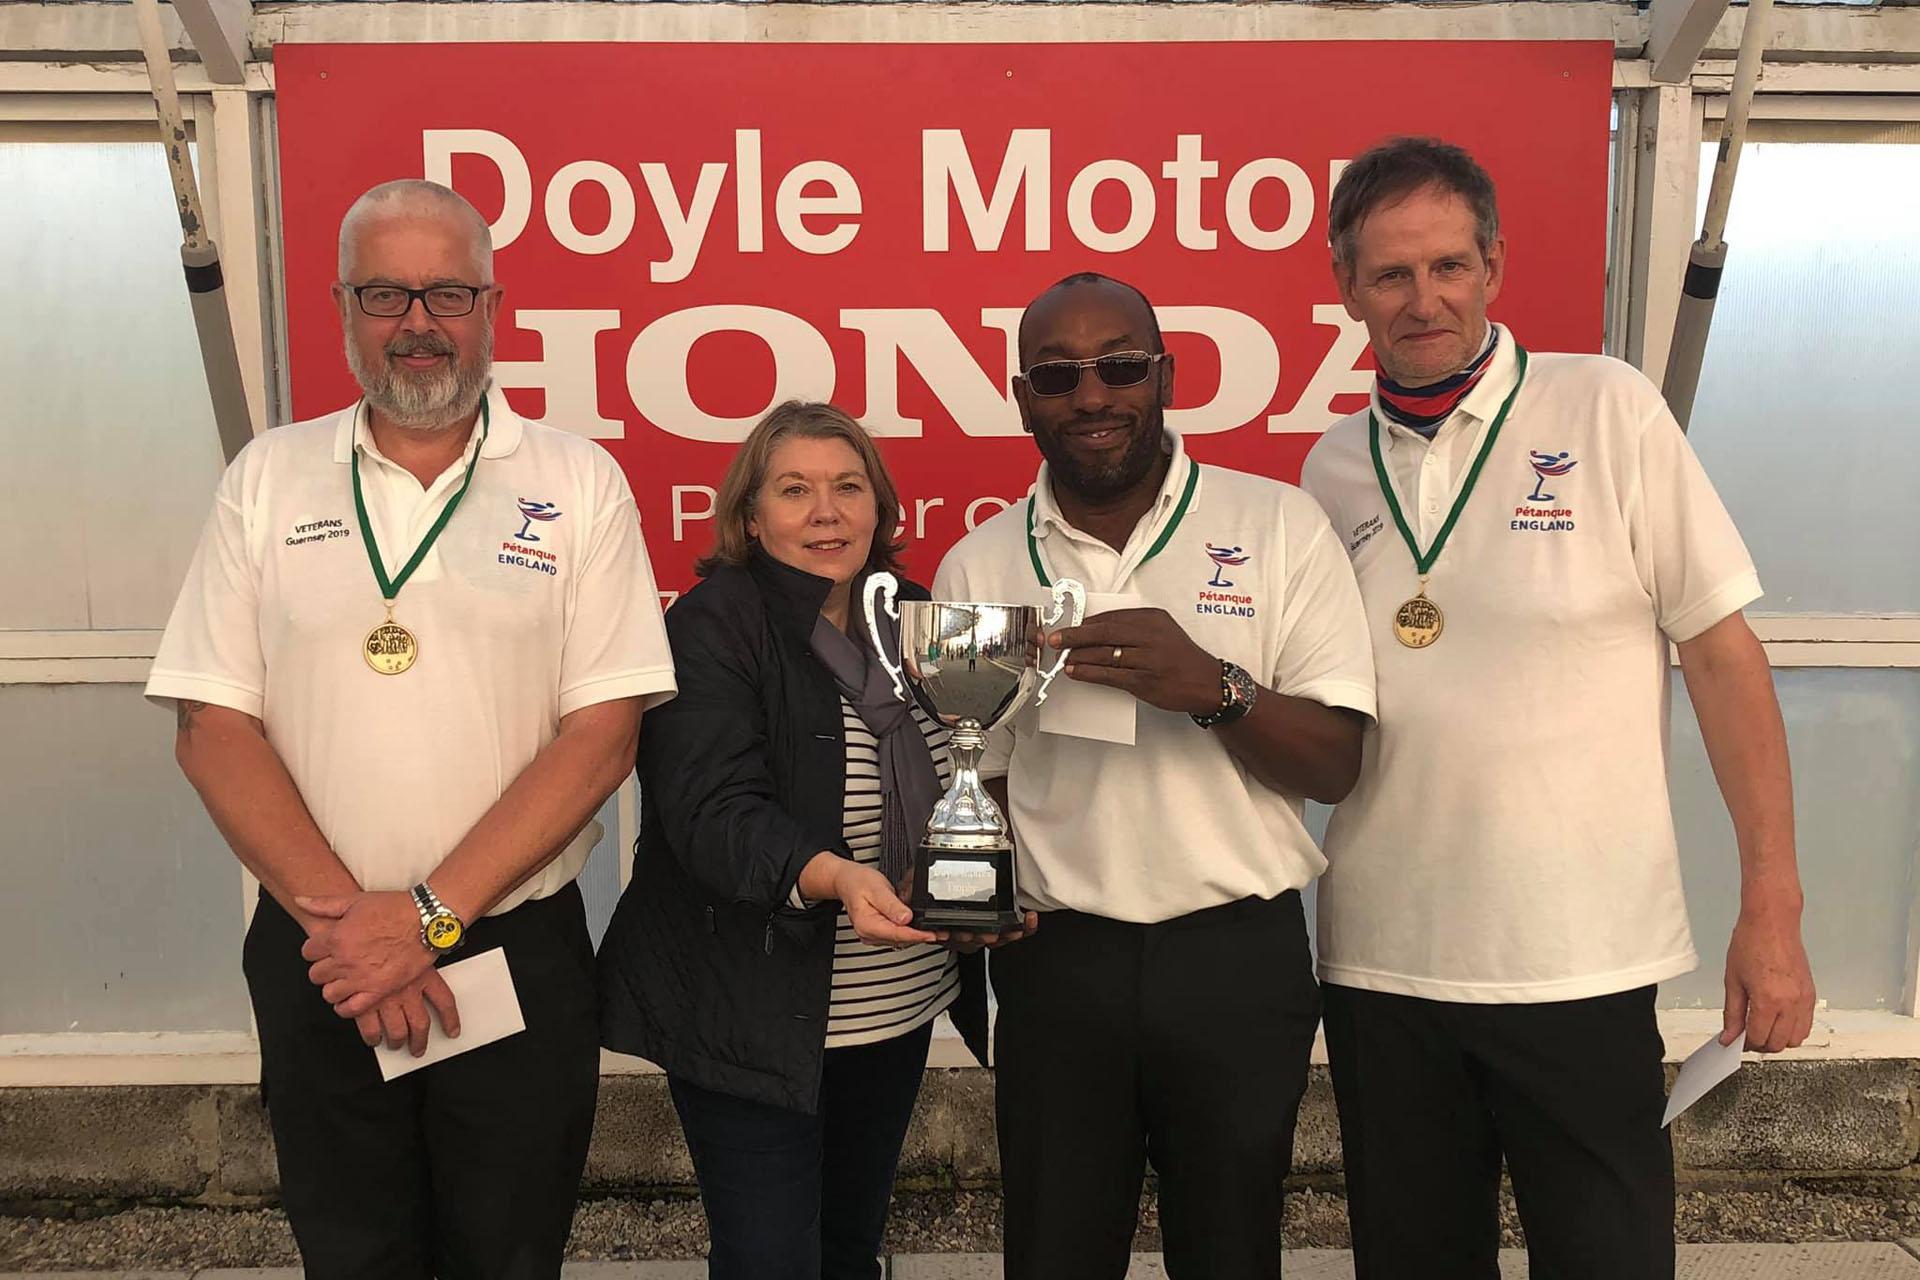 Vets Winners Guernsey 2019